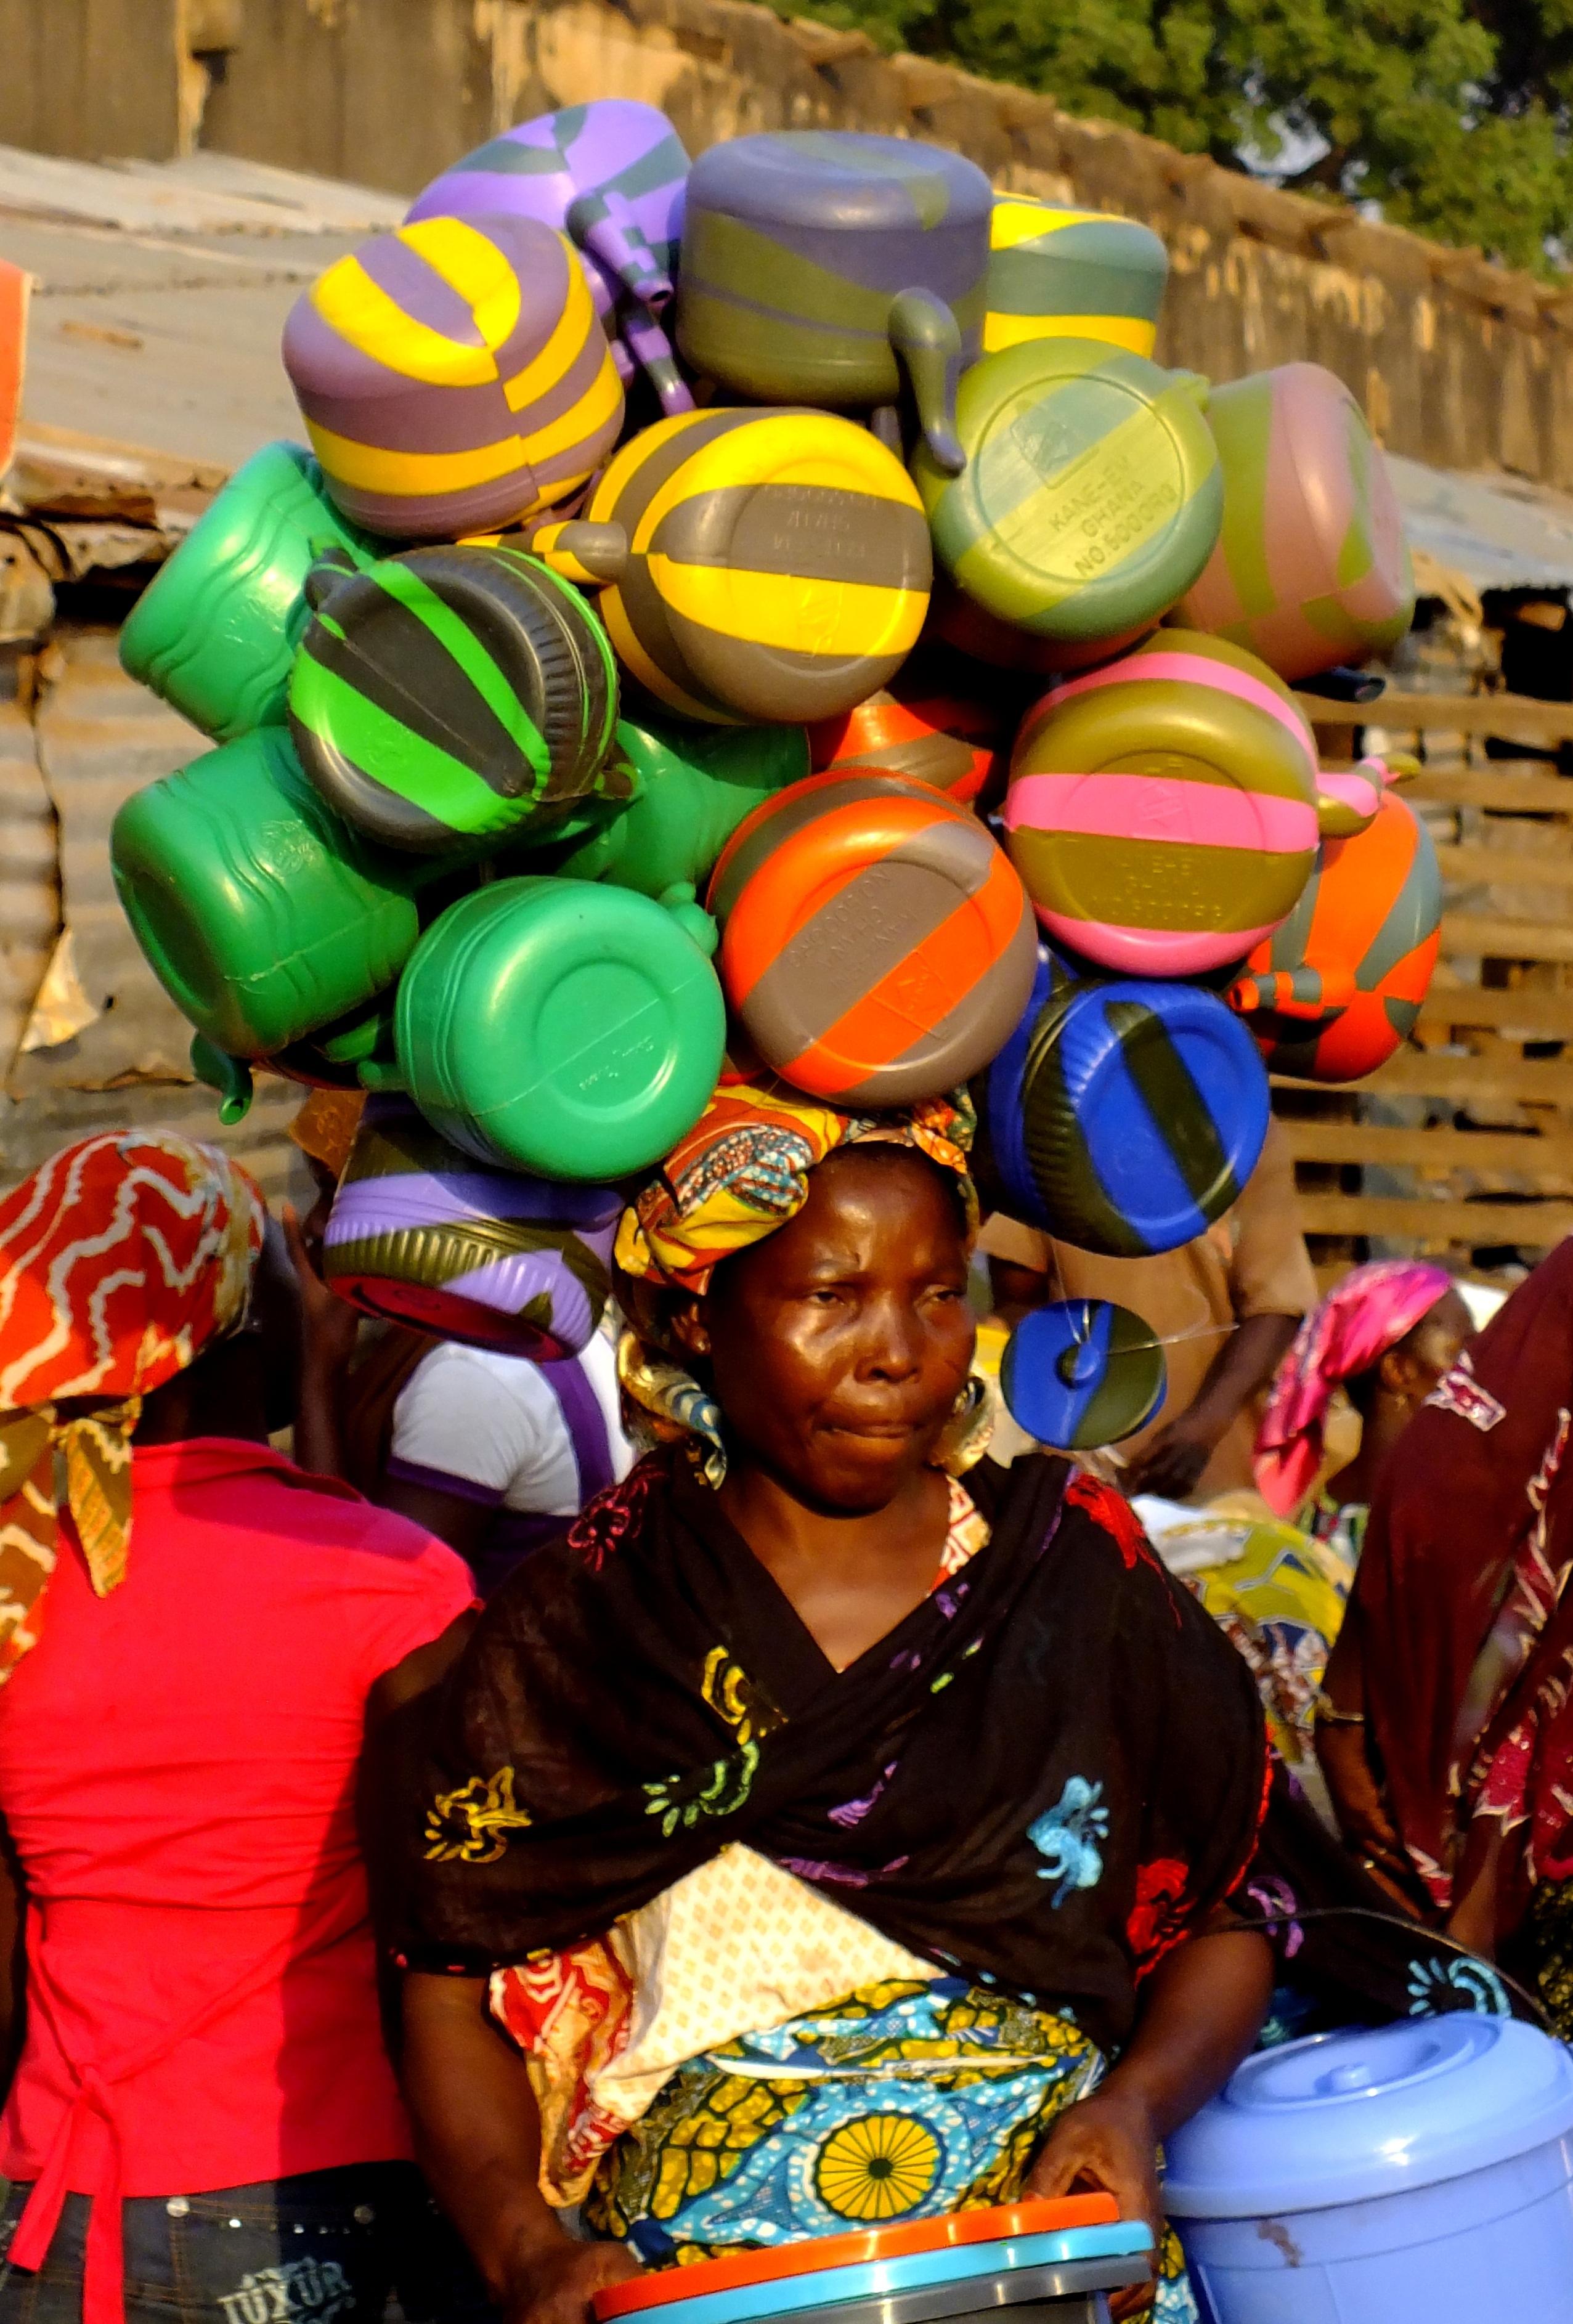 Ghana woman 4 - 1 part 7